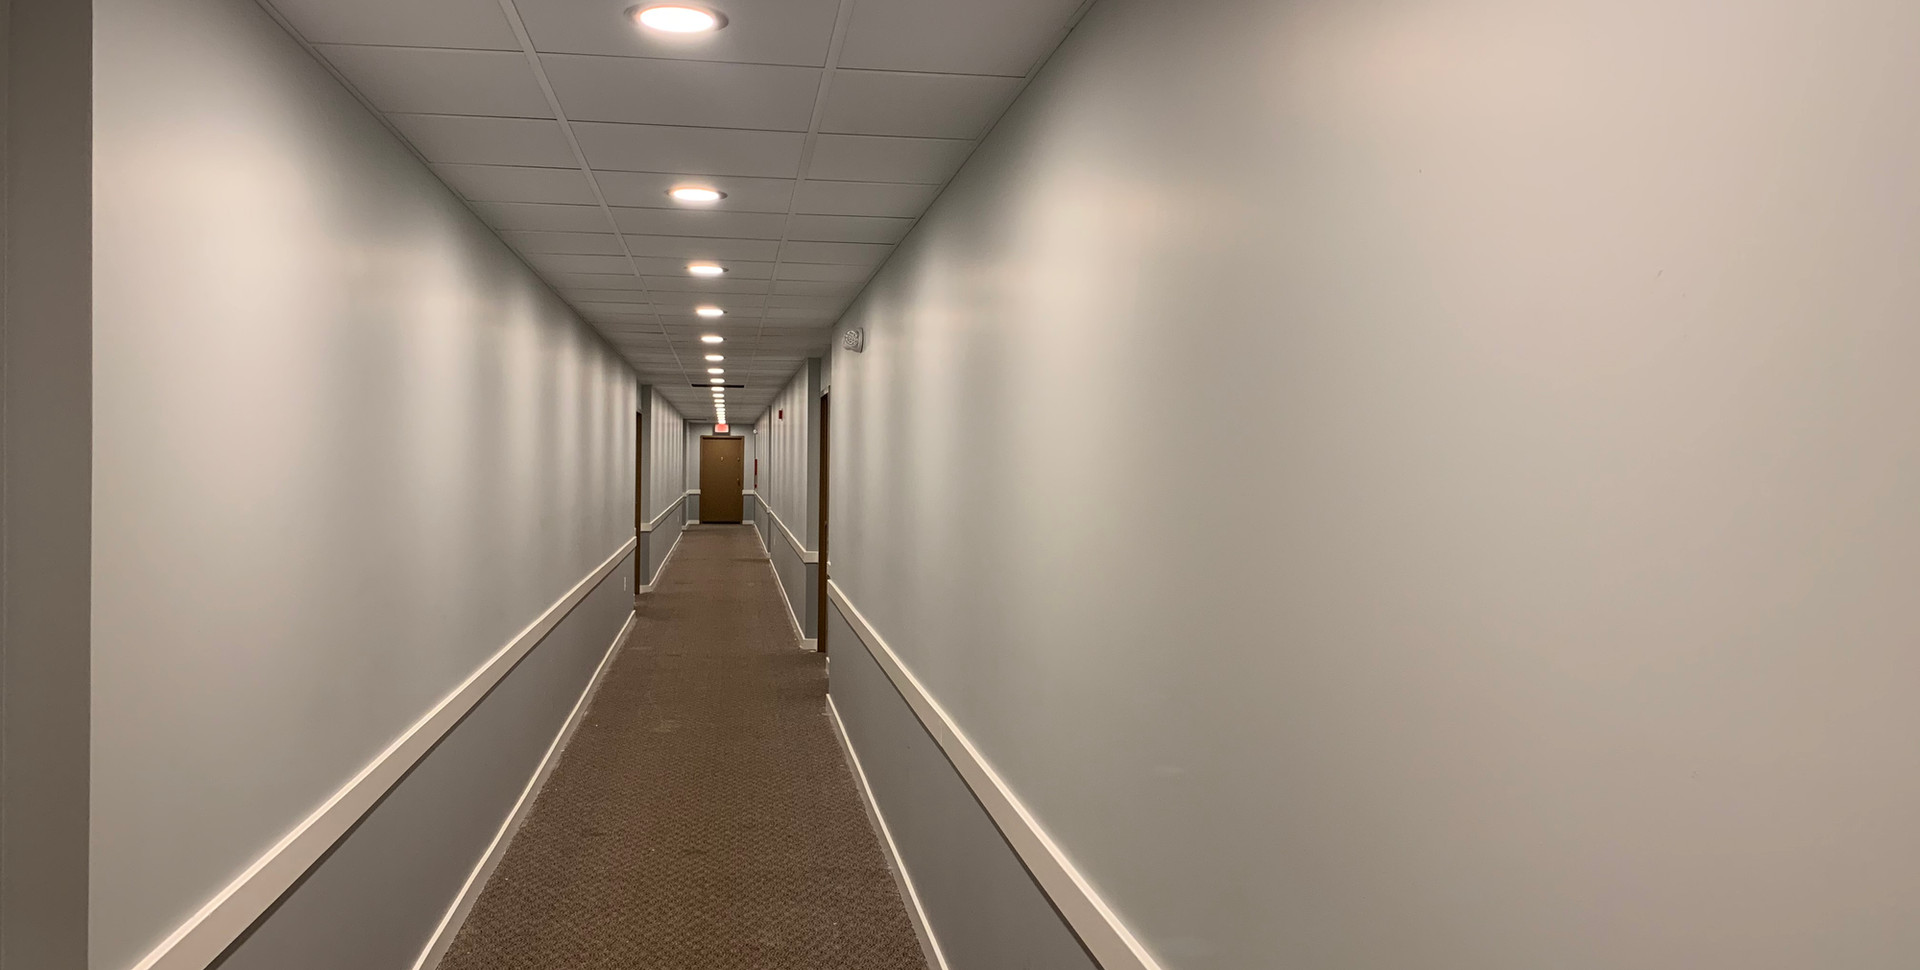 16_Hallway_with old carpet.jpg